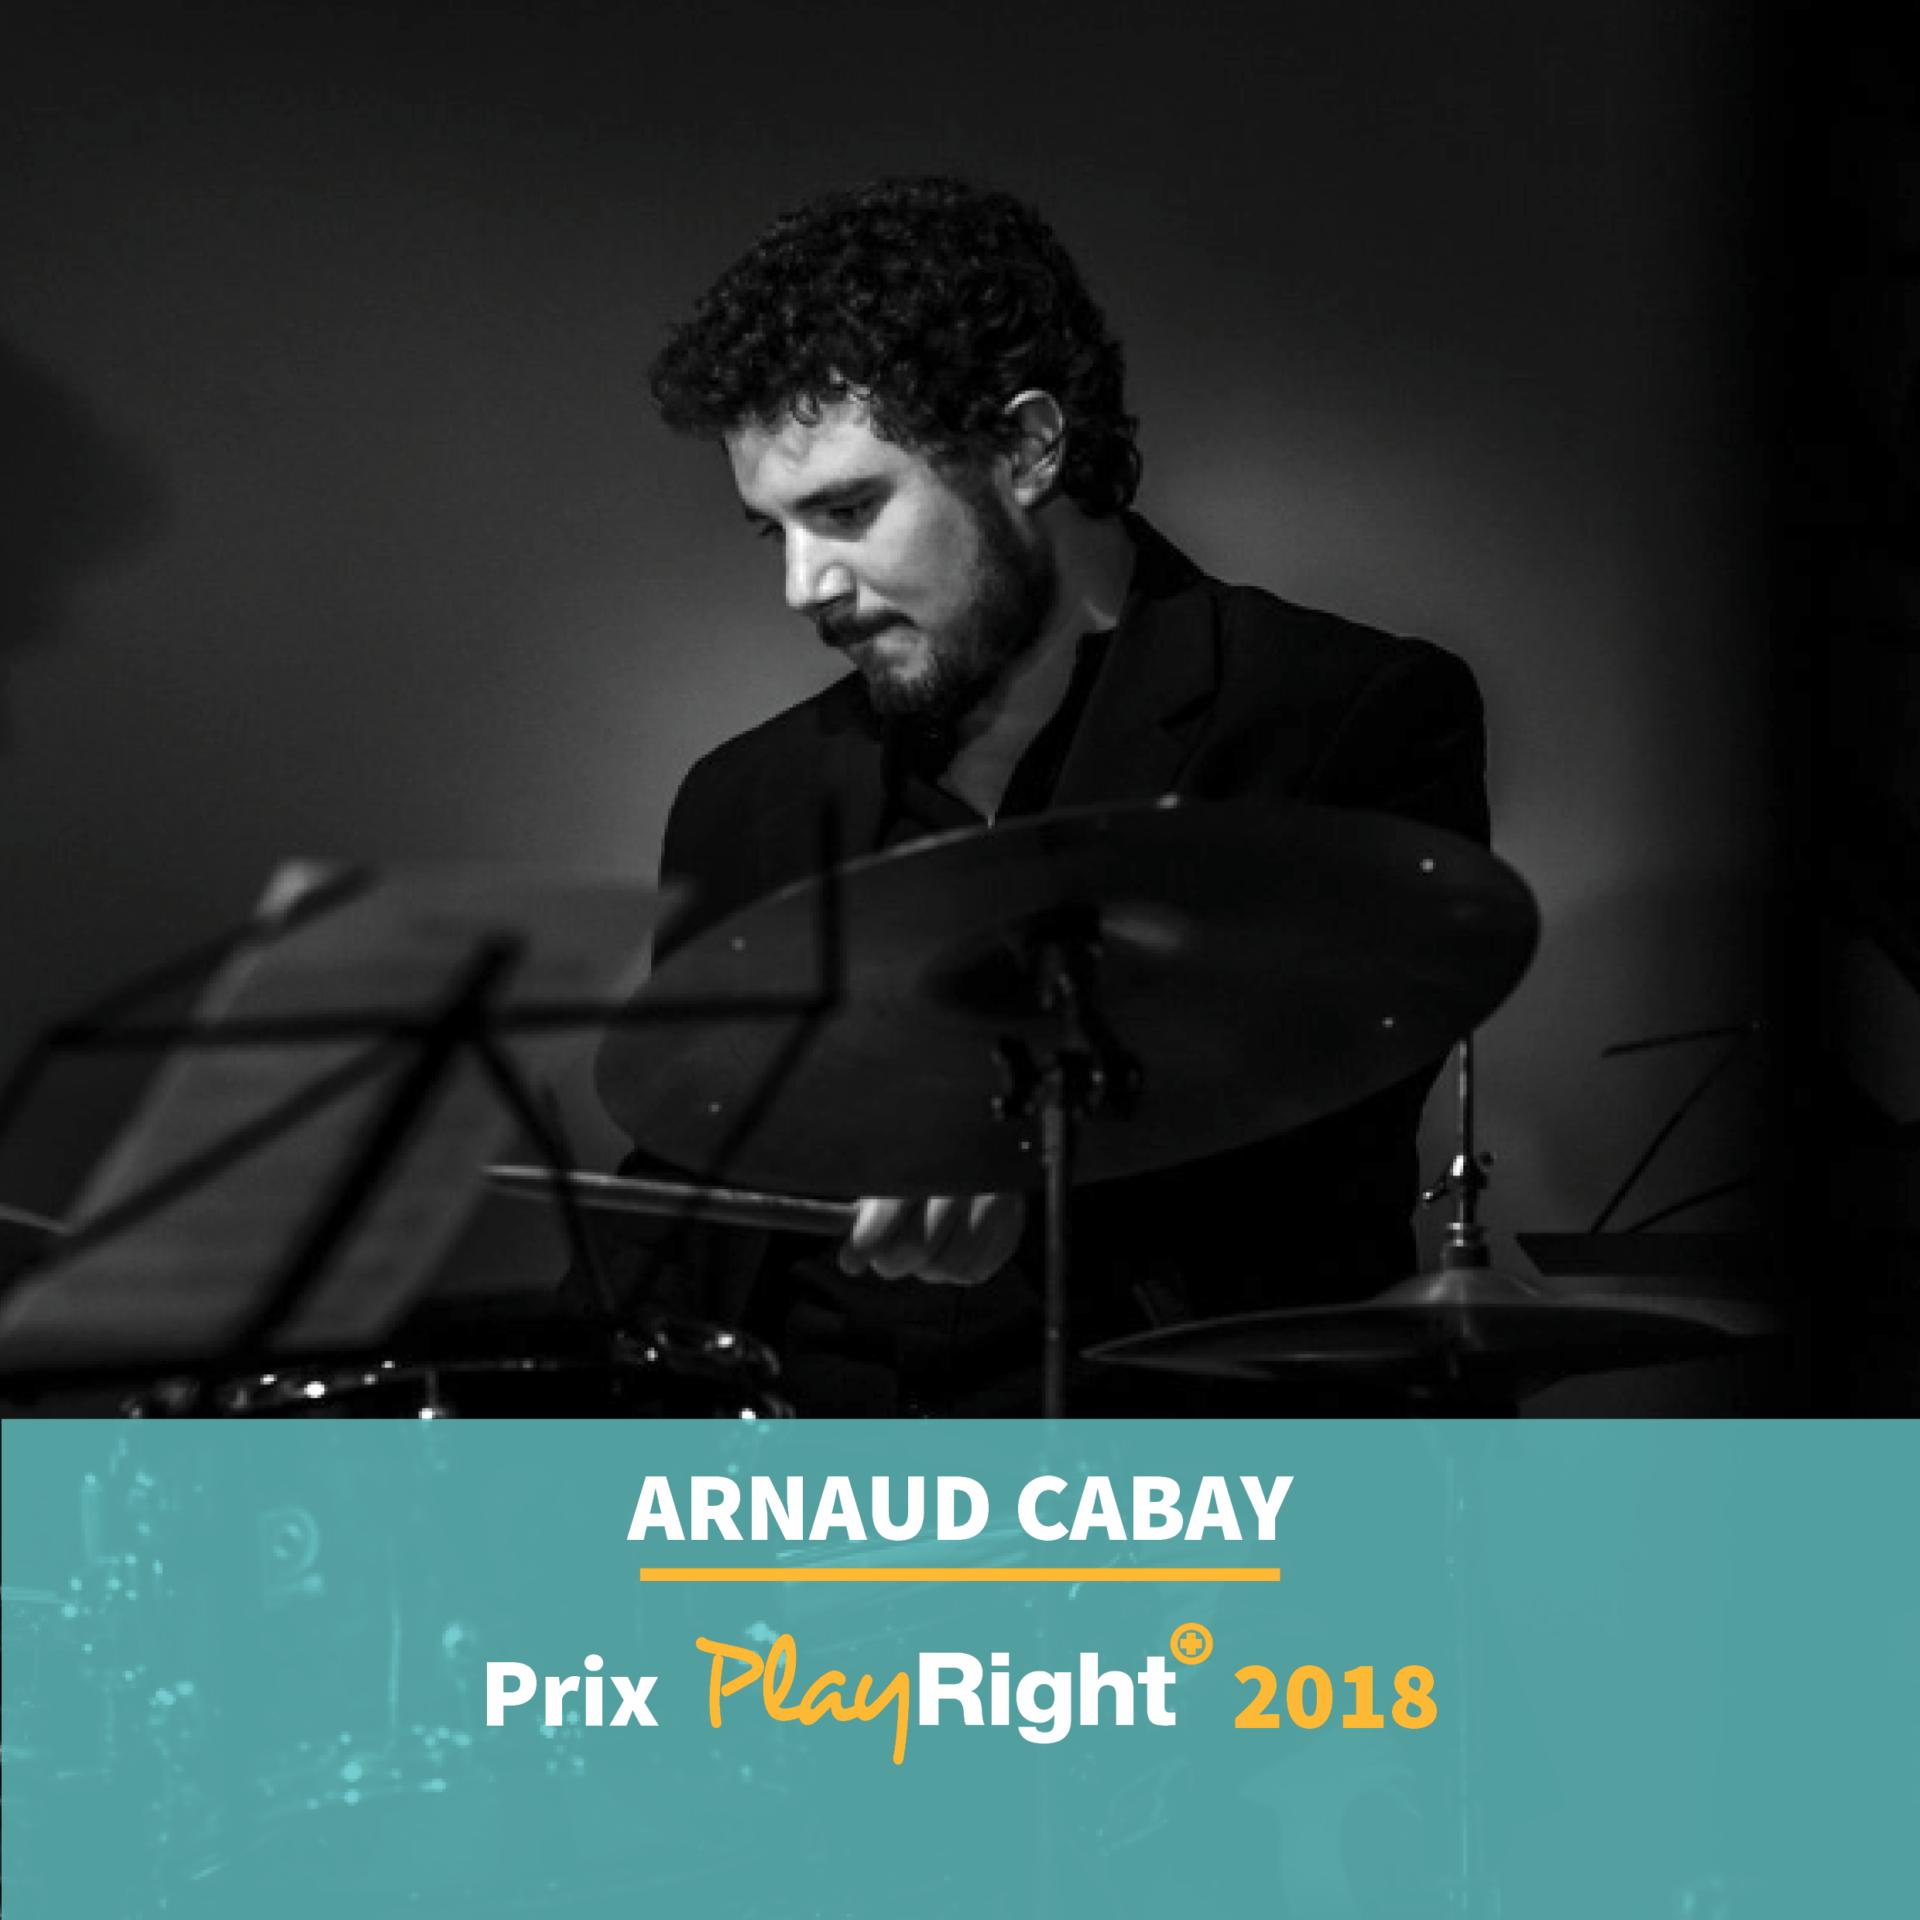 Arnaud Cabay